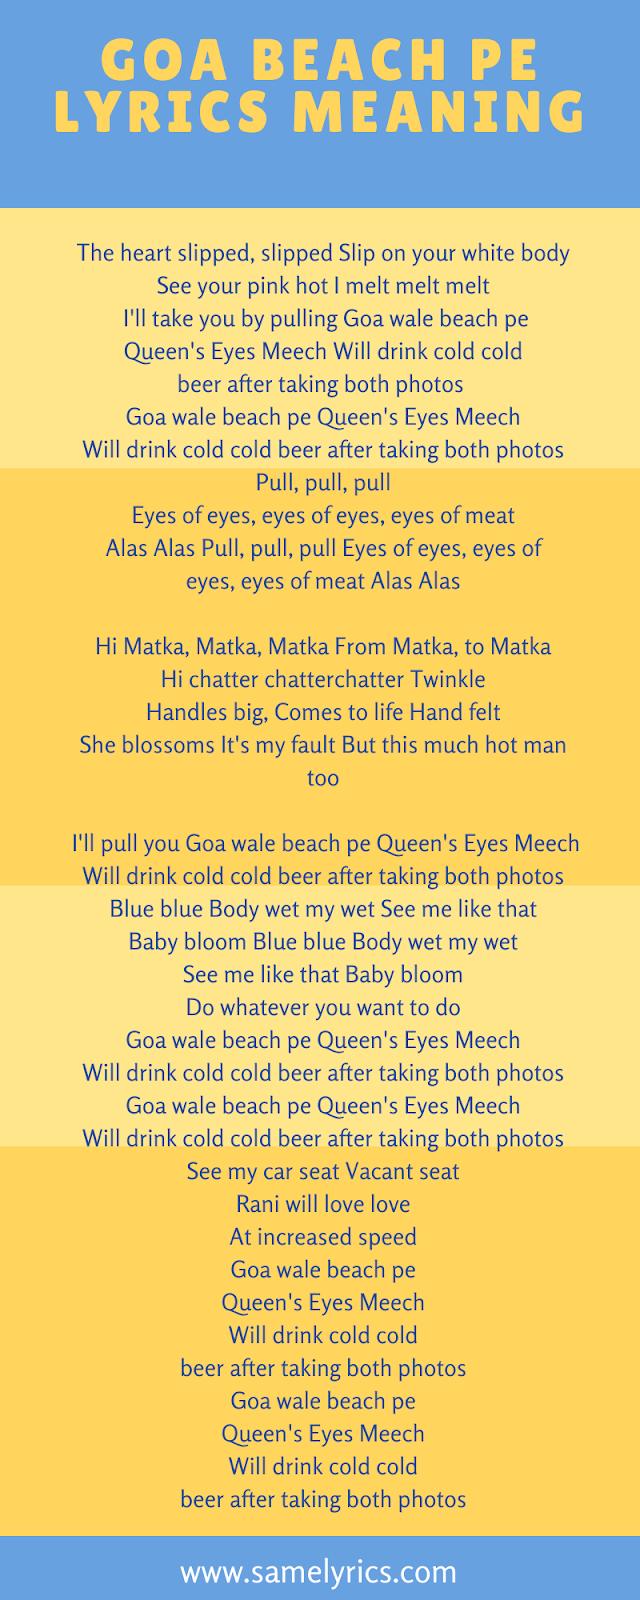 Goa Beach Pe Lyrics meaning